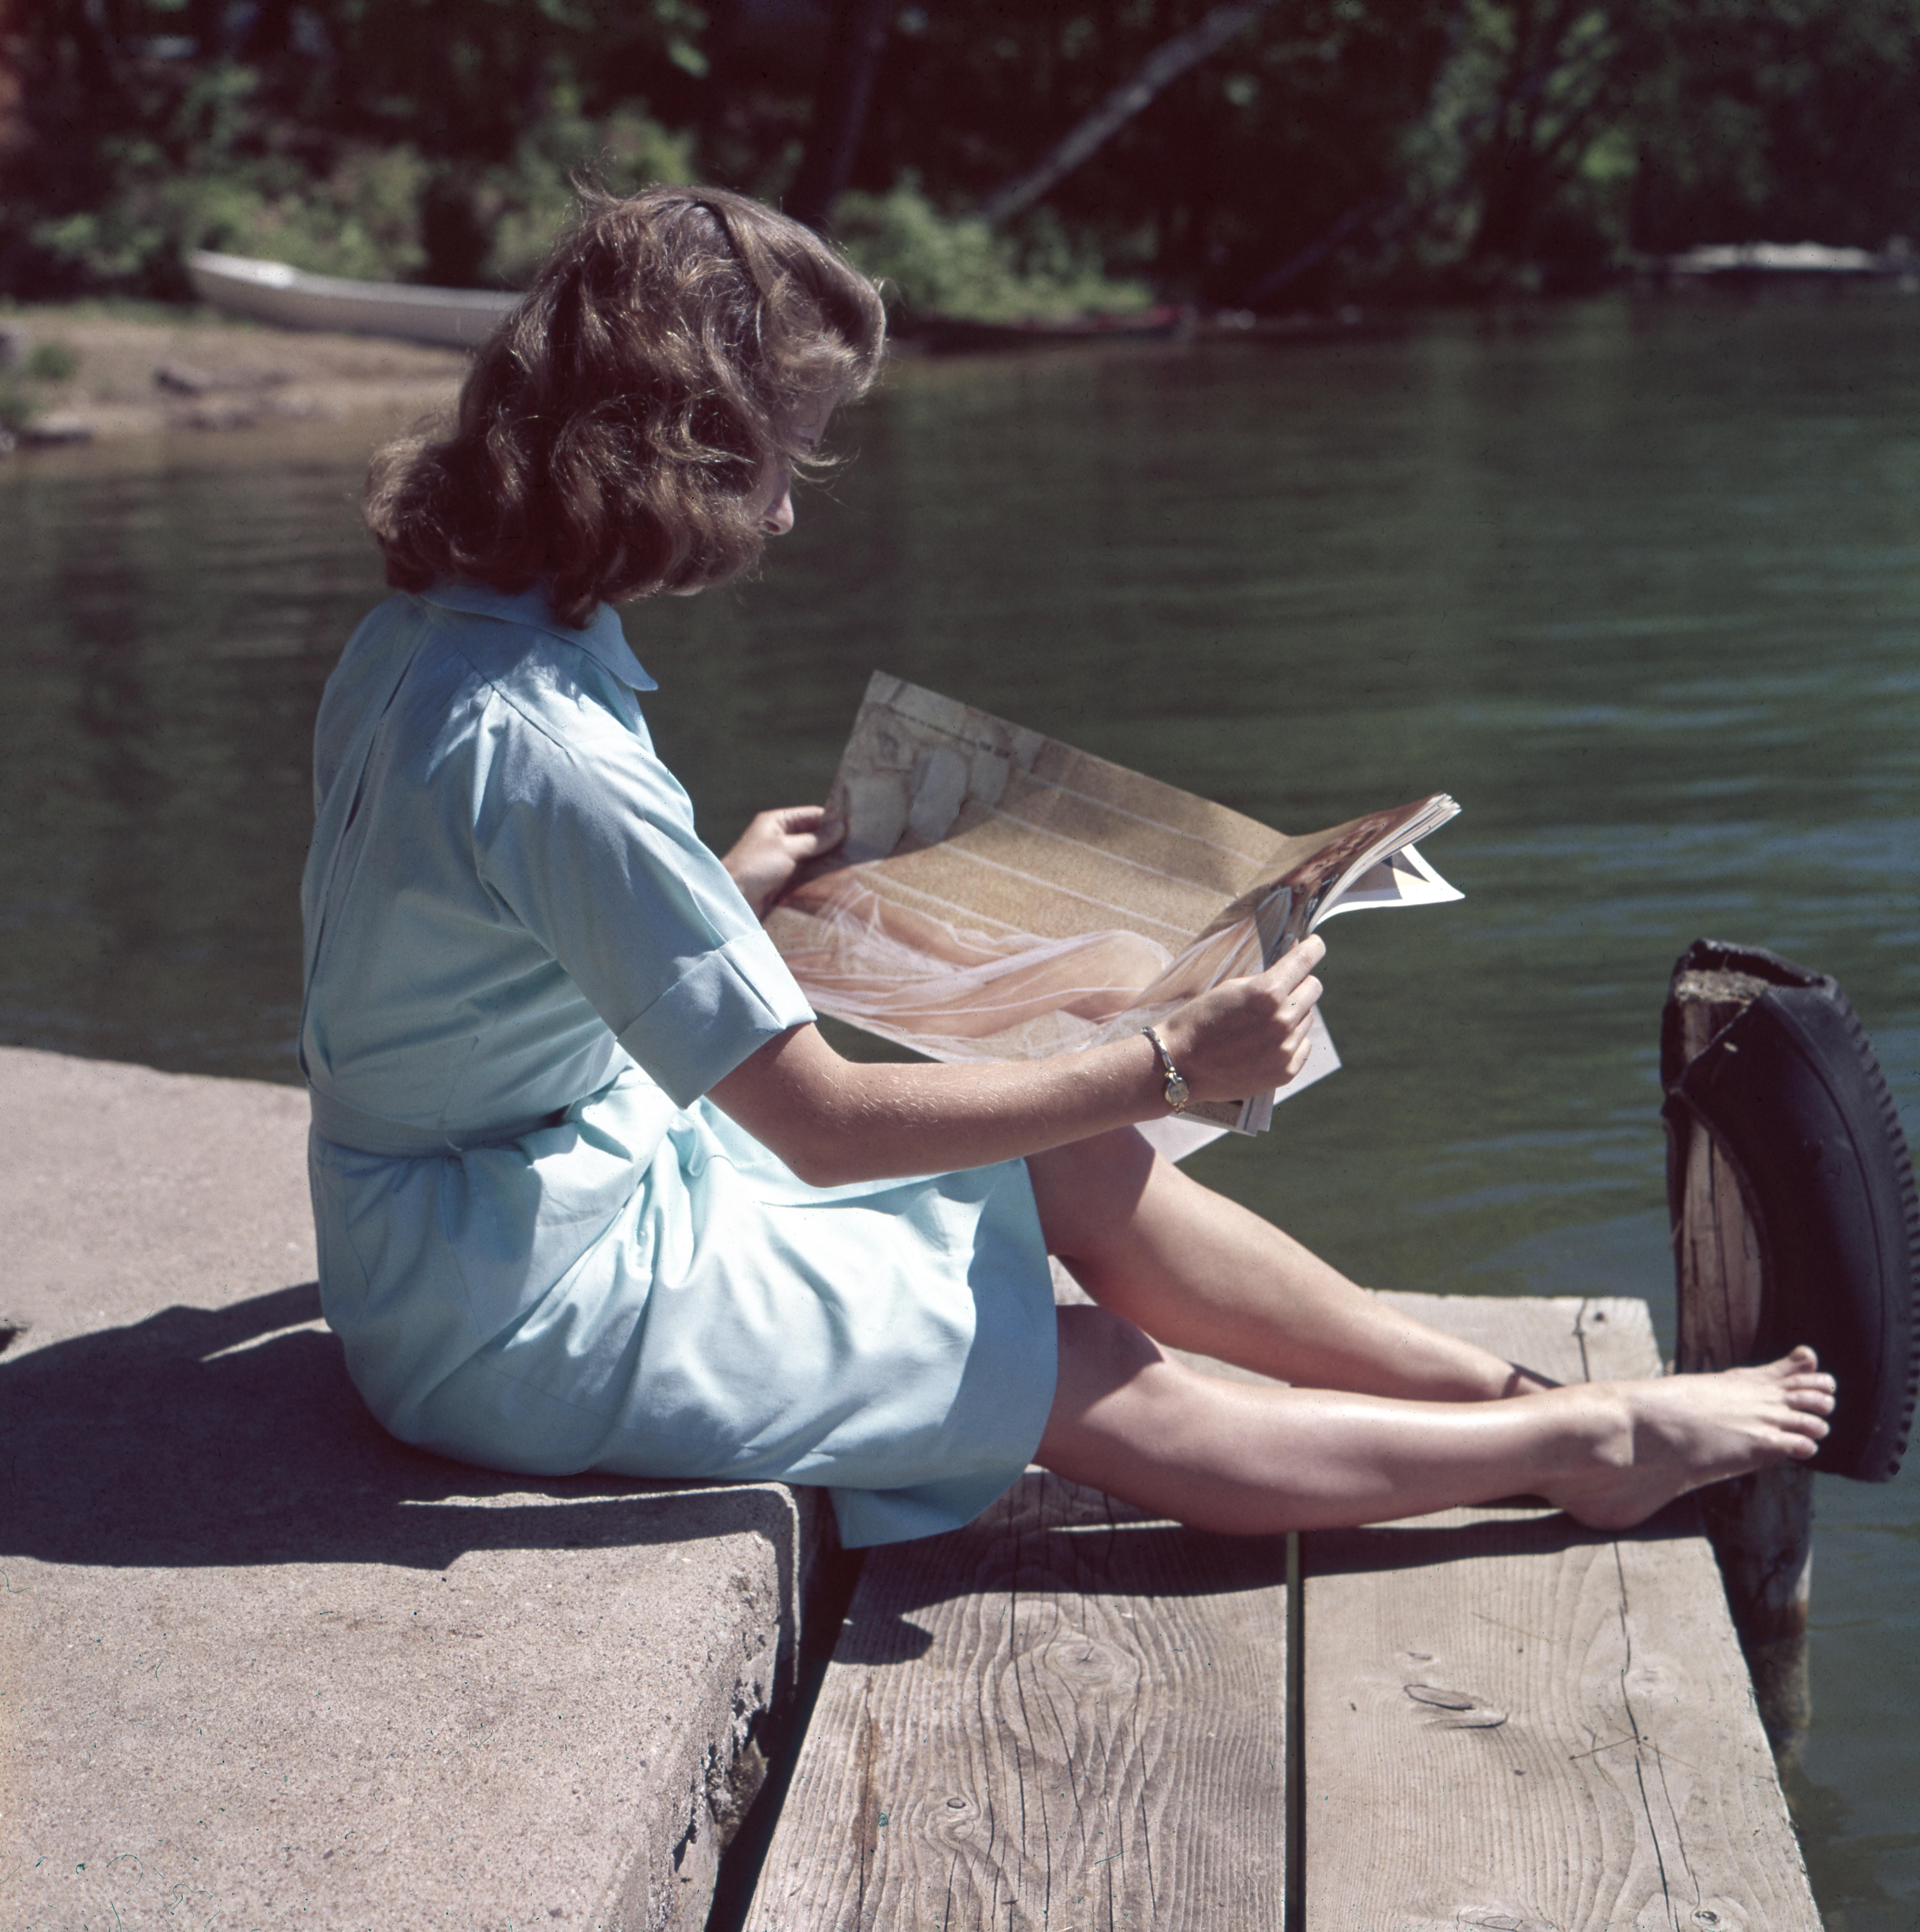 woman wearing blue dress reading magazine near body of water during daytime